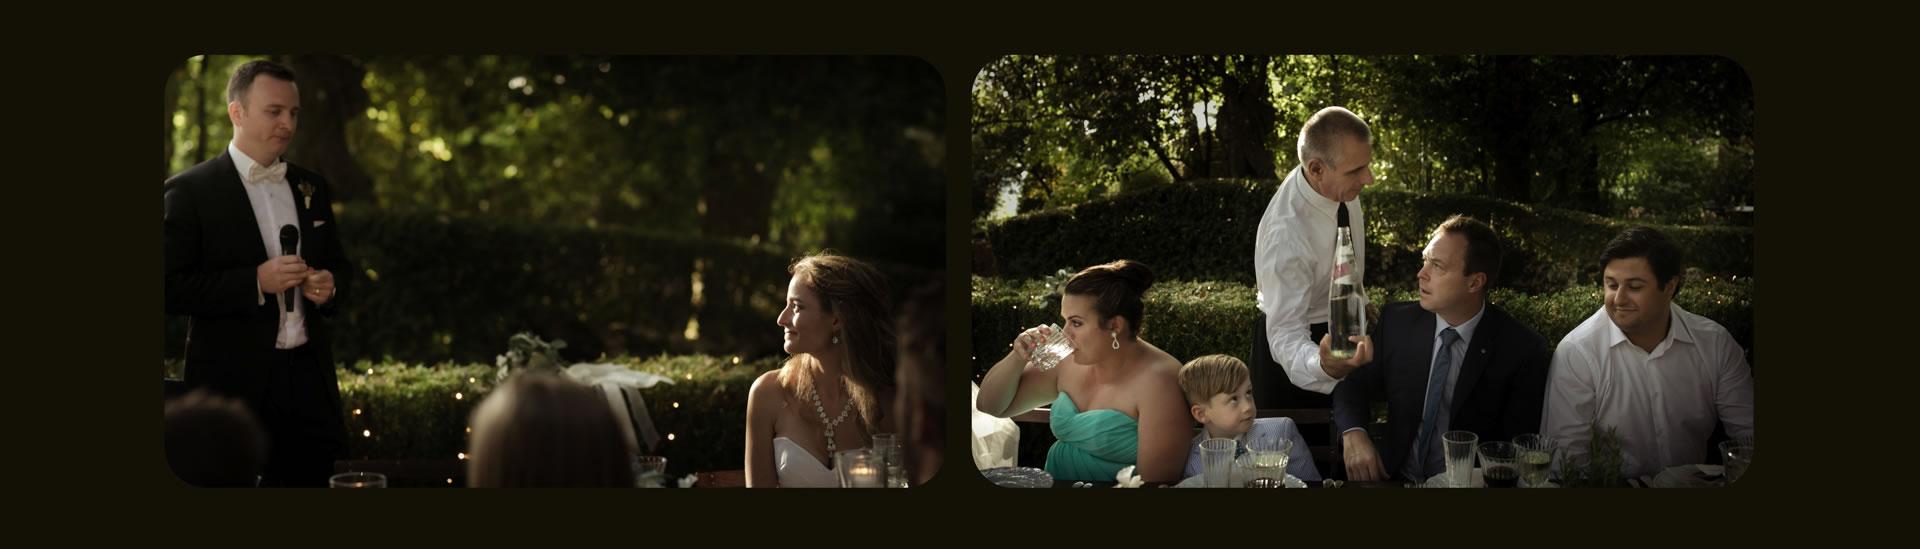 borgo-stomennano-david-bastianoni-photographer-00042 - 42 :: Wedding at Borgo Stomennano // WPPI 2018 // Our love is here to stay :: Luxury wedding photography - 41 :: borgo-stomennano-david-bastianoni-photographer-00042 - 42